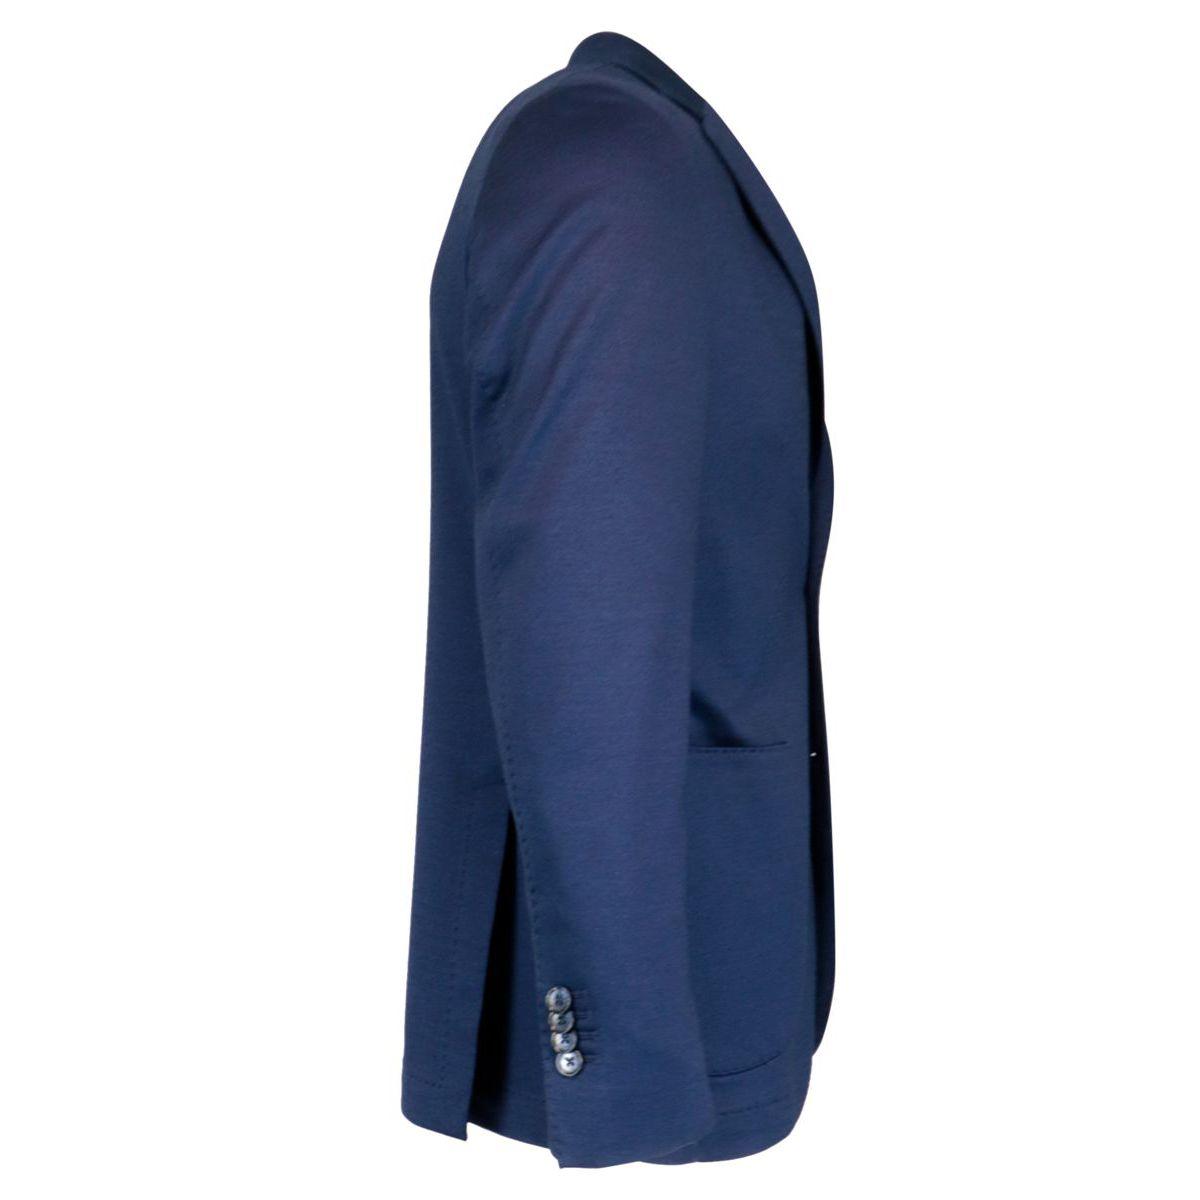 Two-button jacket in stretch cotton Indigo L.B.M. 1911